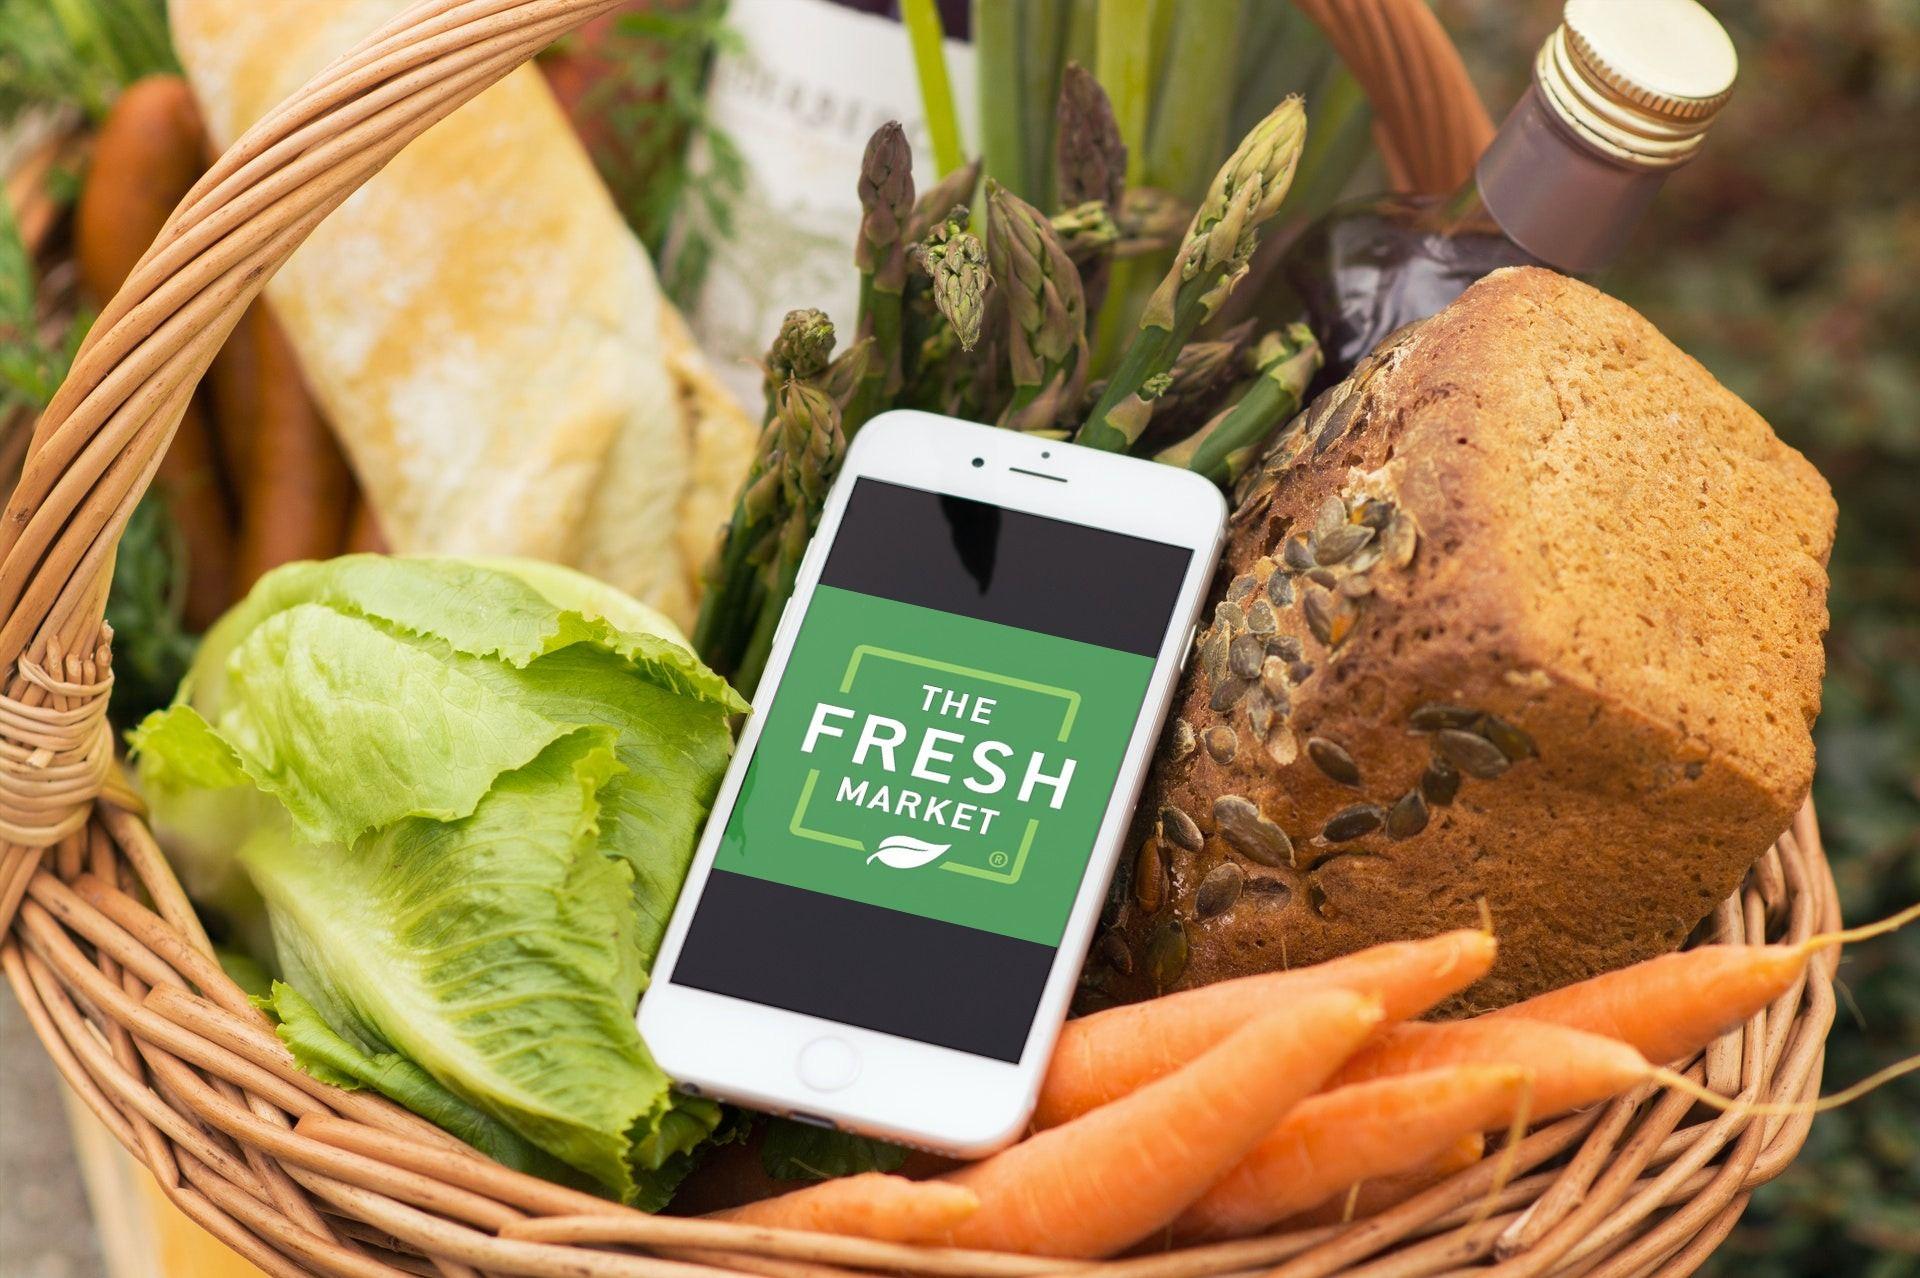 Fresh Market Initial Public Offering